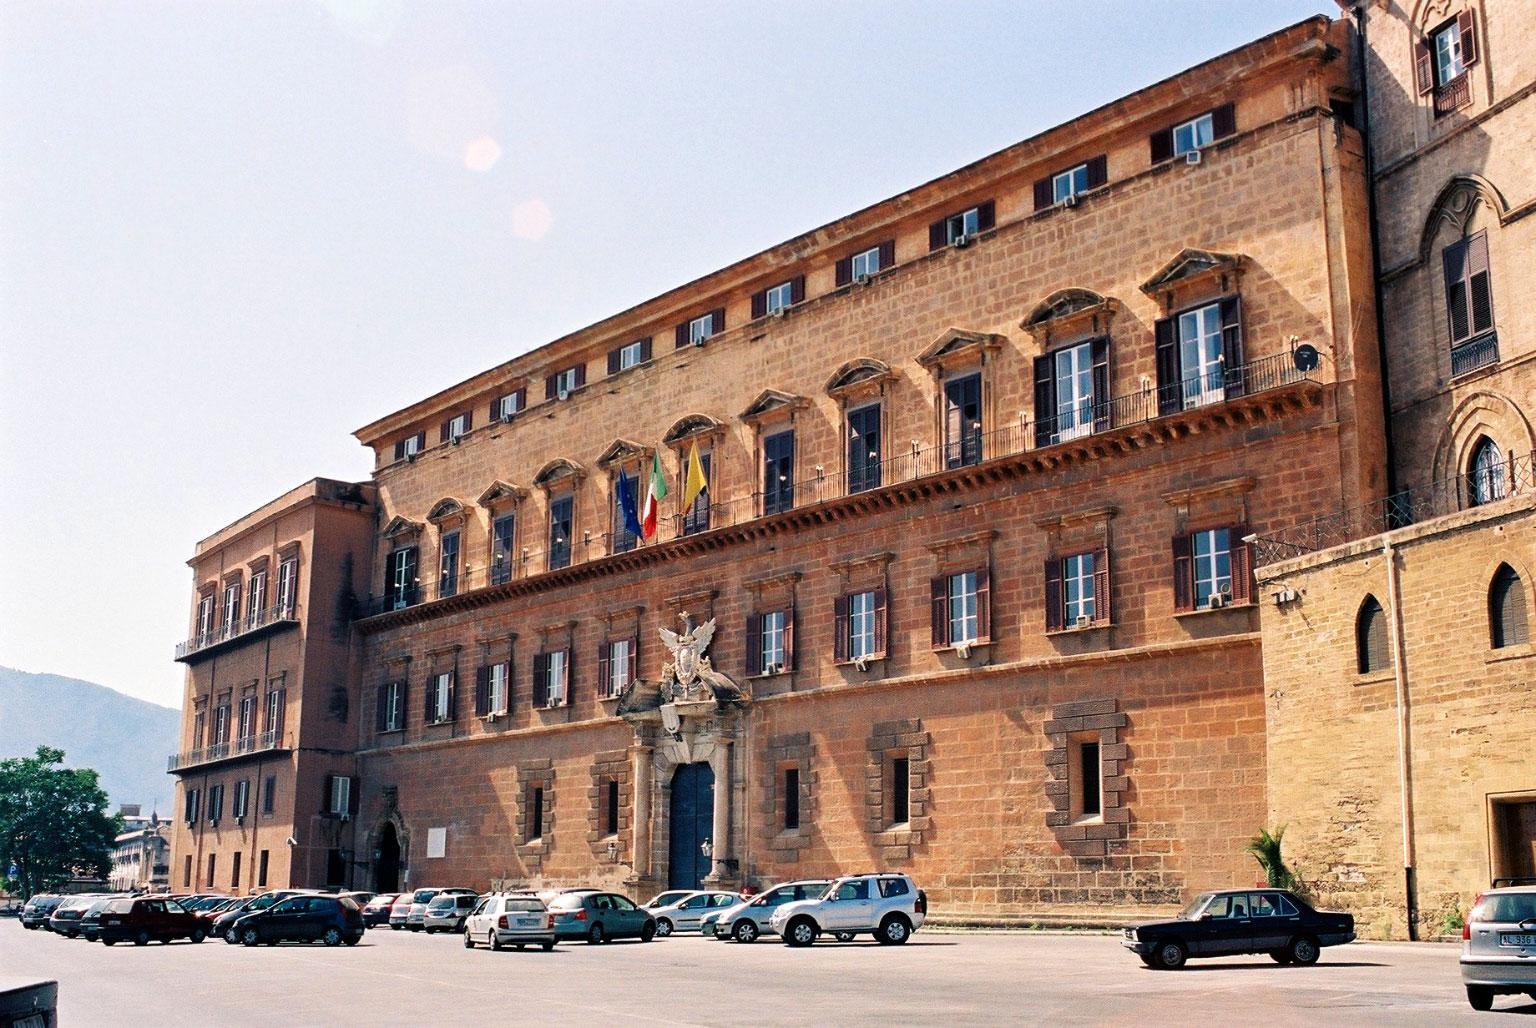 Ars, gruppo misto restituisce 70 mila euro$